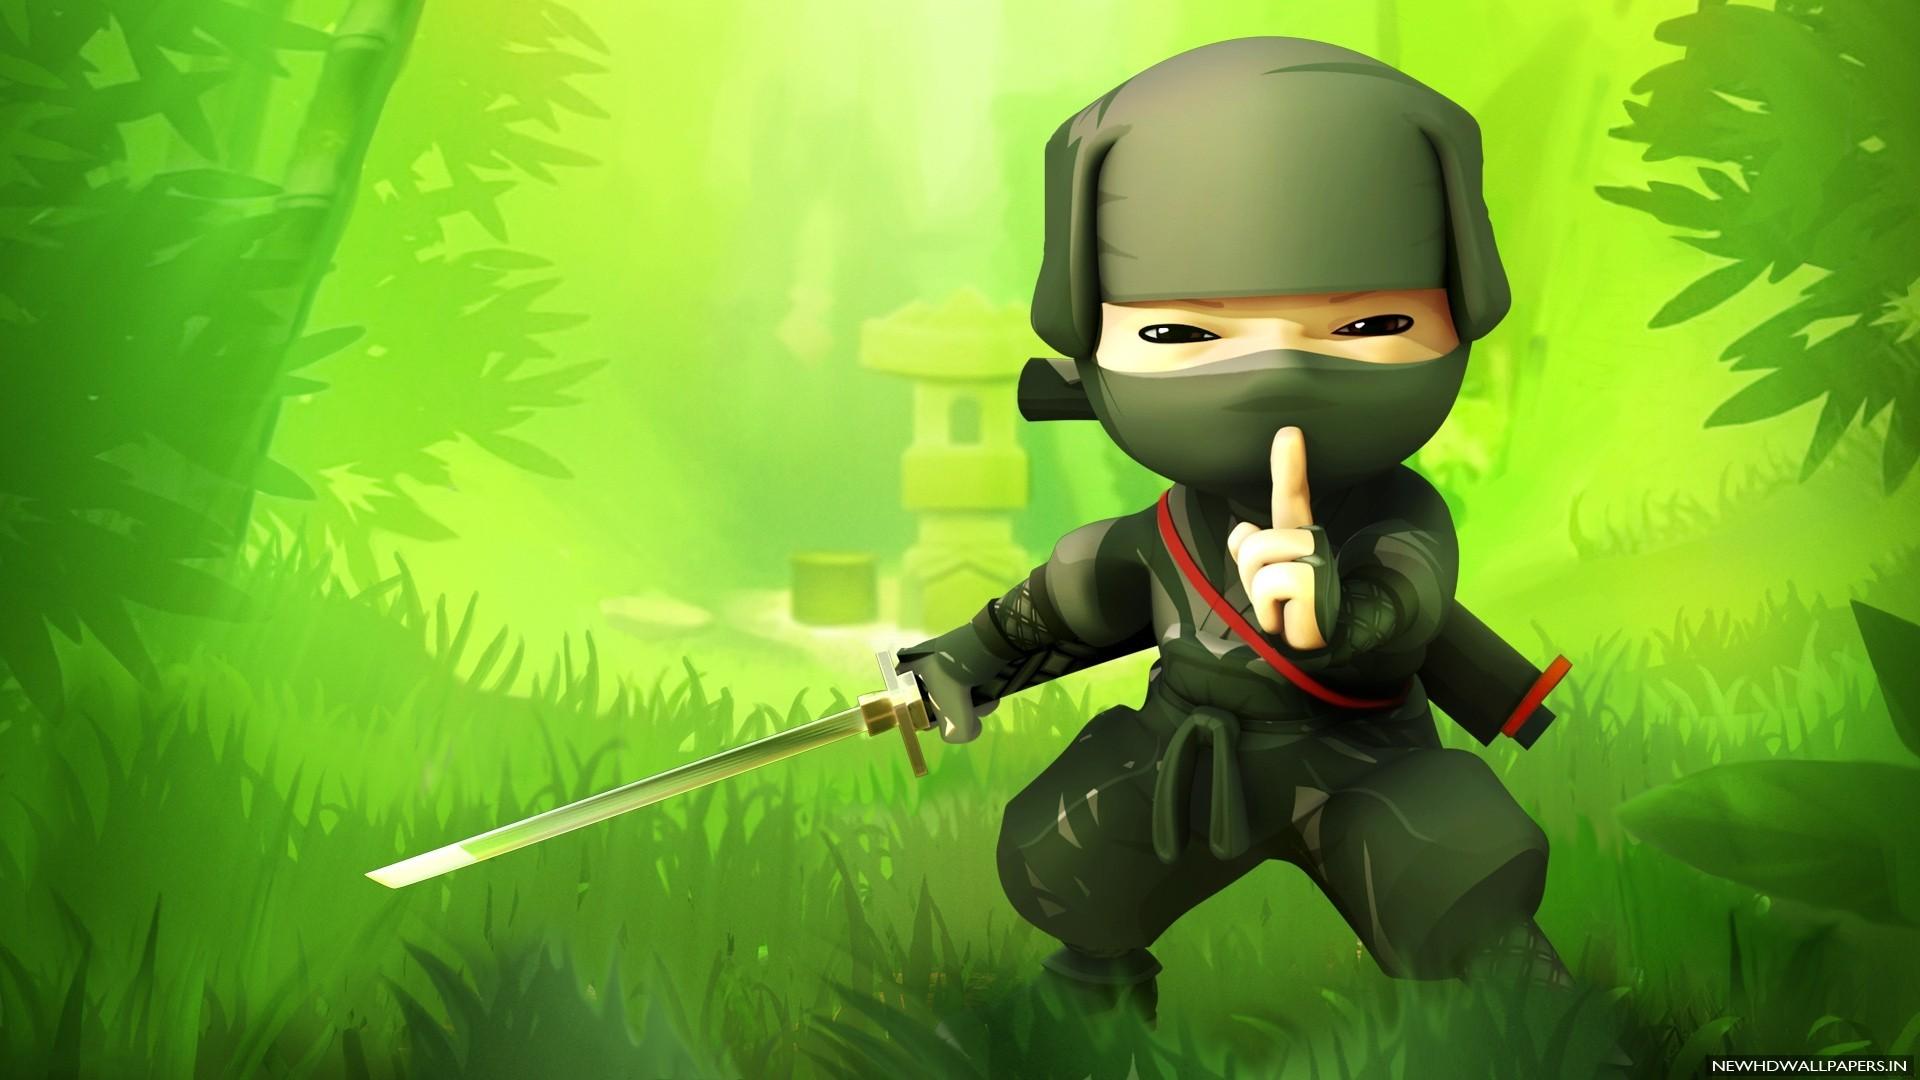 Ninja wallpapers hd wallpapersafari New all hd video